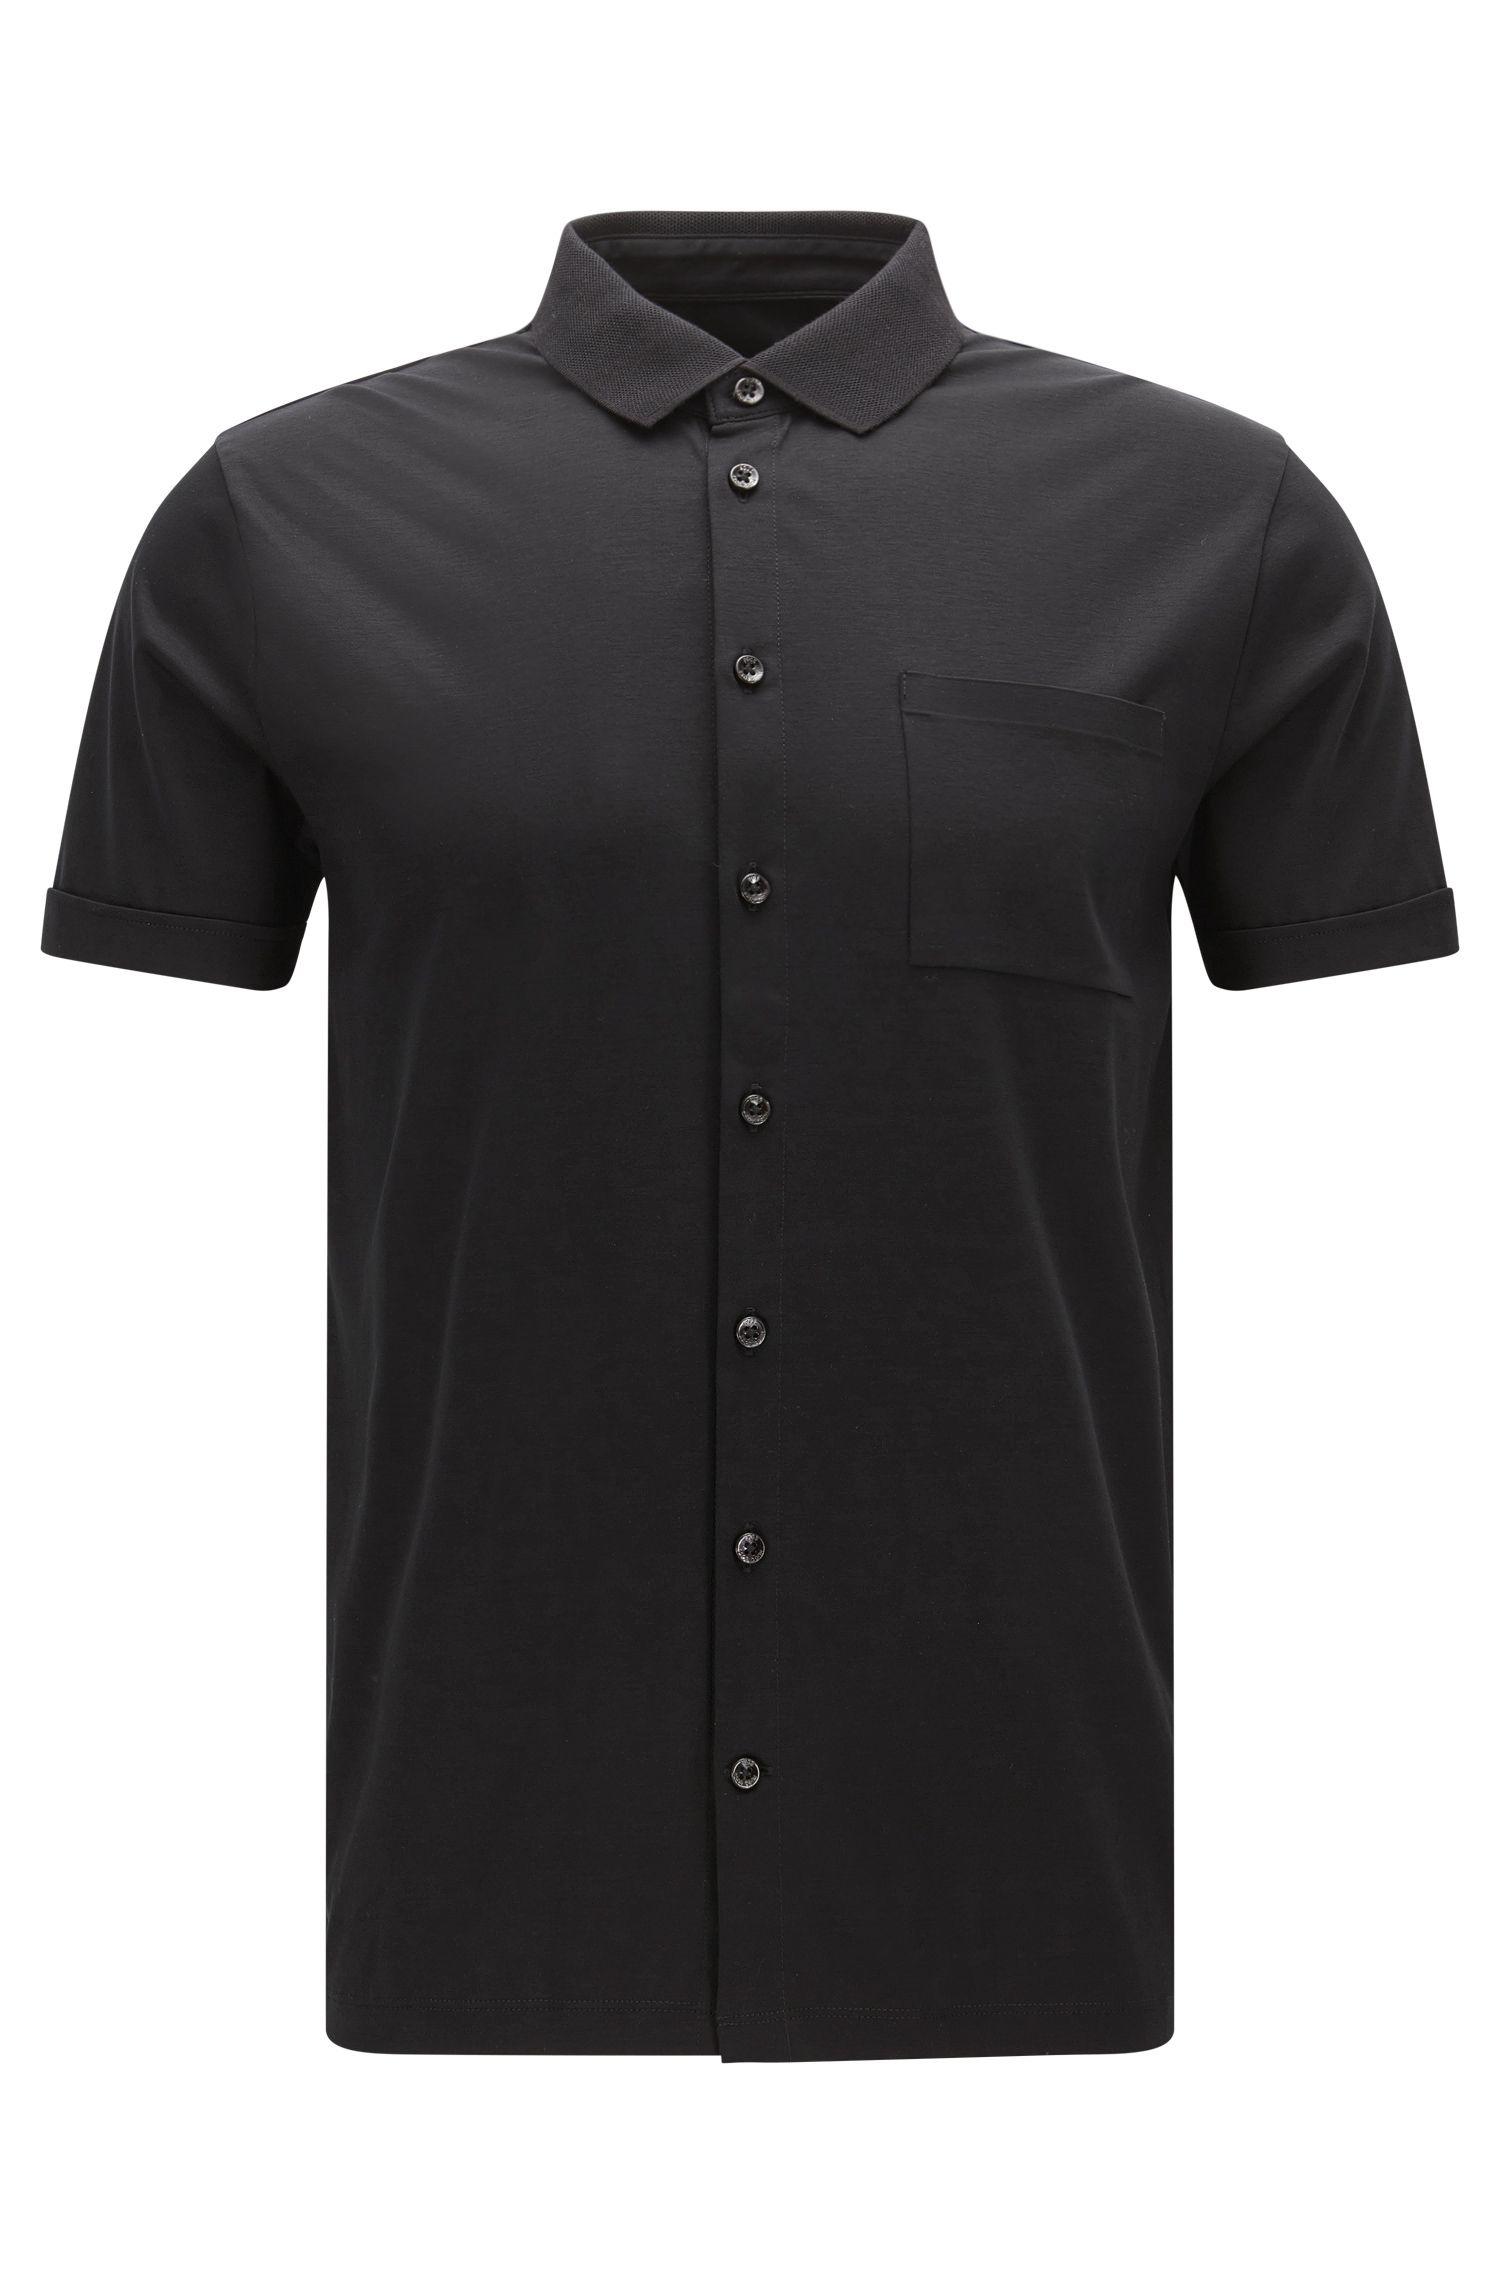 'Puno' | Slim Fit, Cotton Polo Shirt